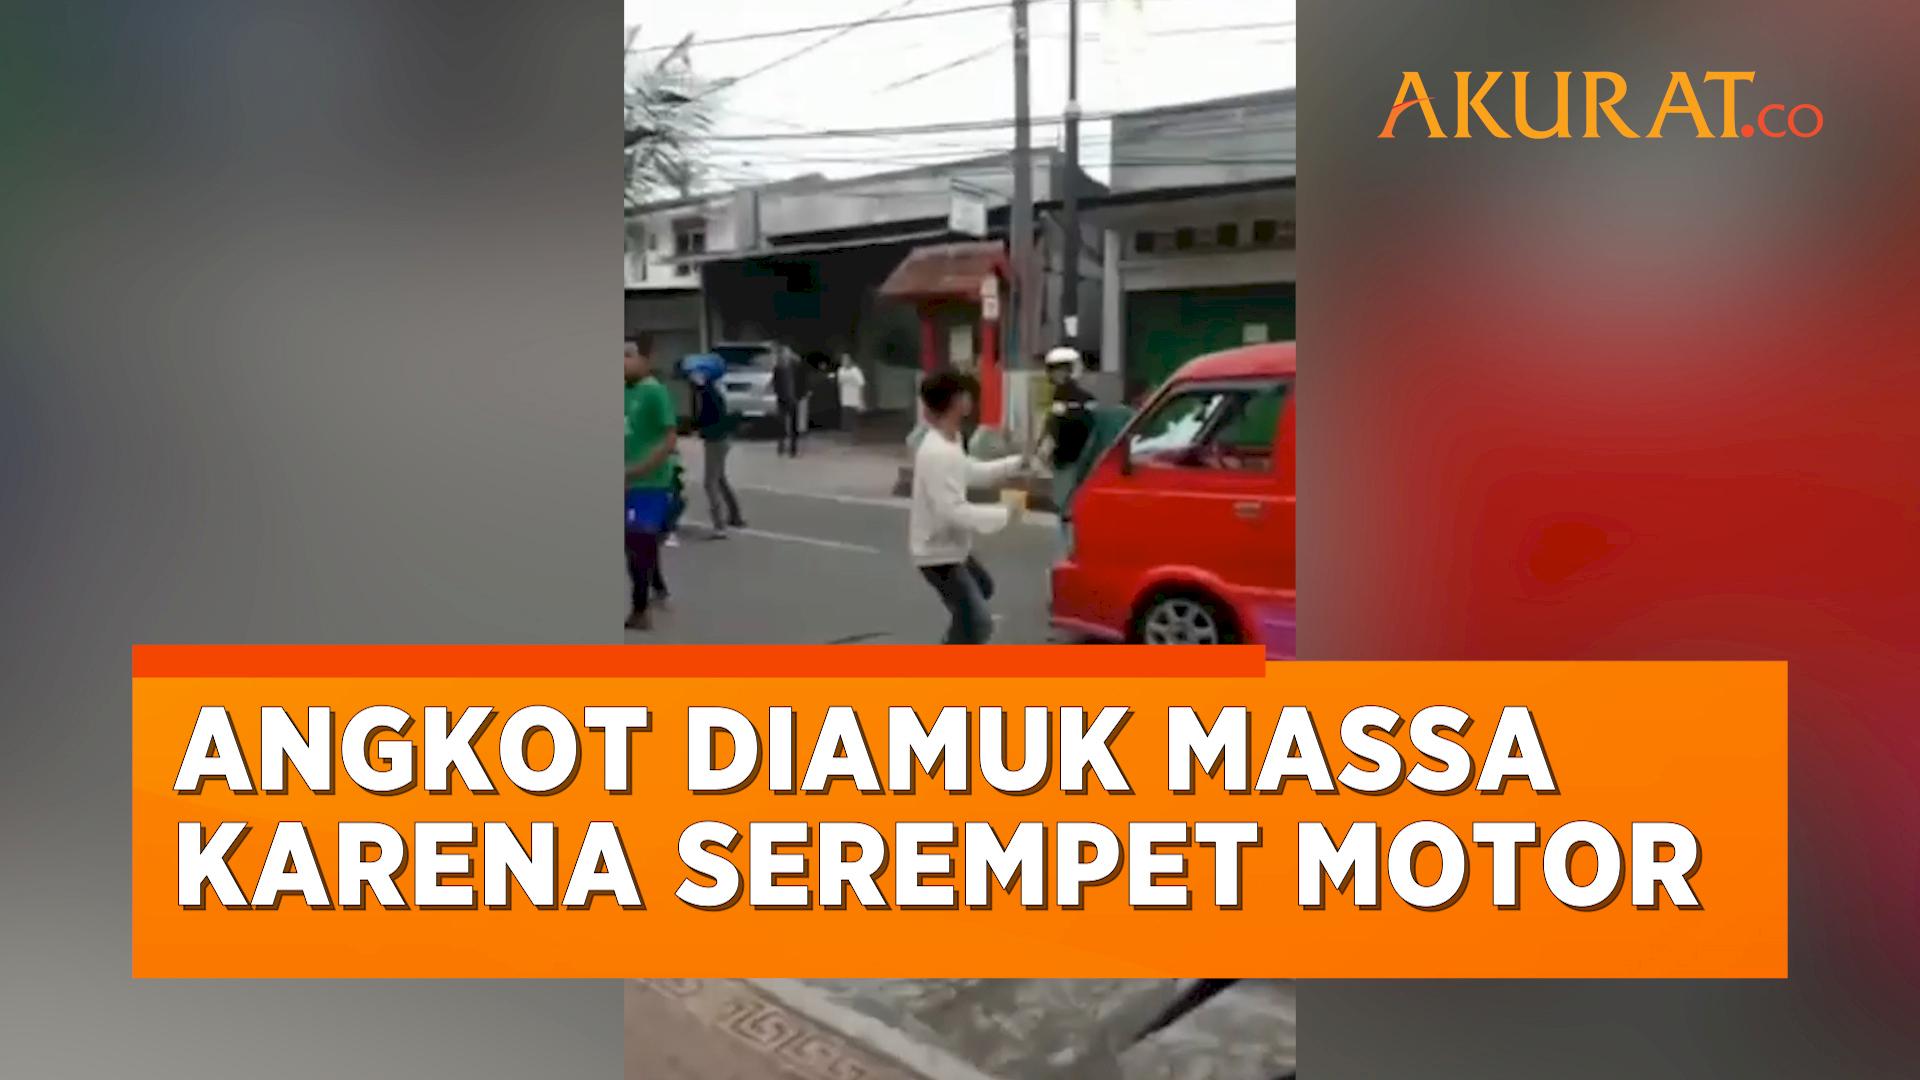 Gara-Gara Menyerempet Pemotor, Angkot di Cianjur Langsung Diamuk Massa